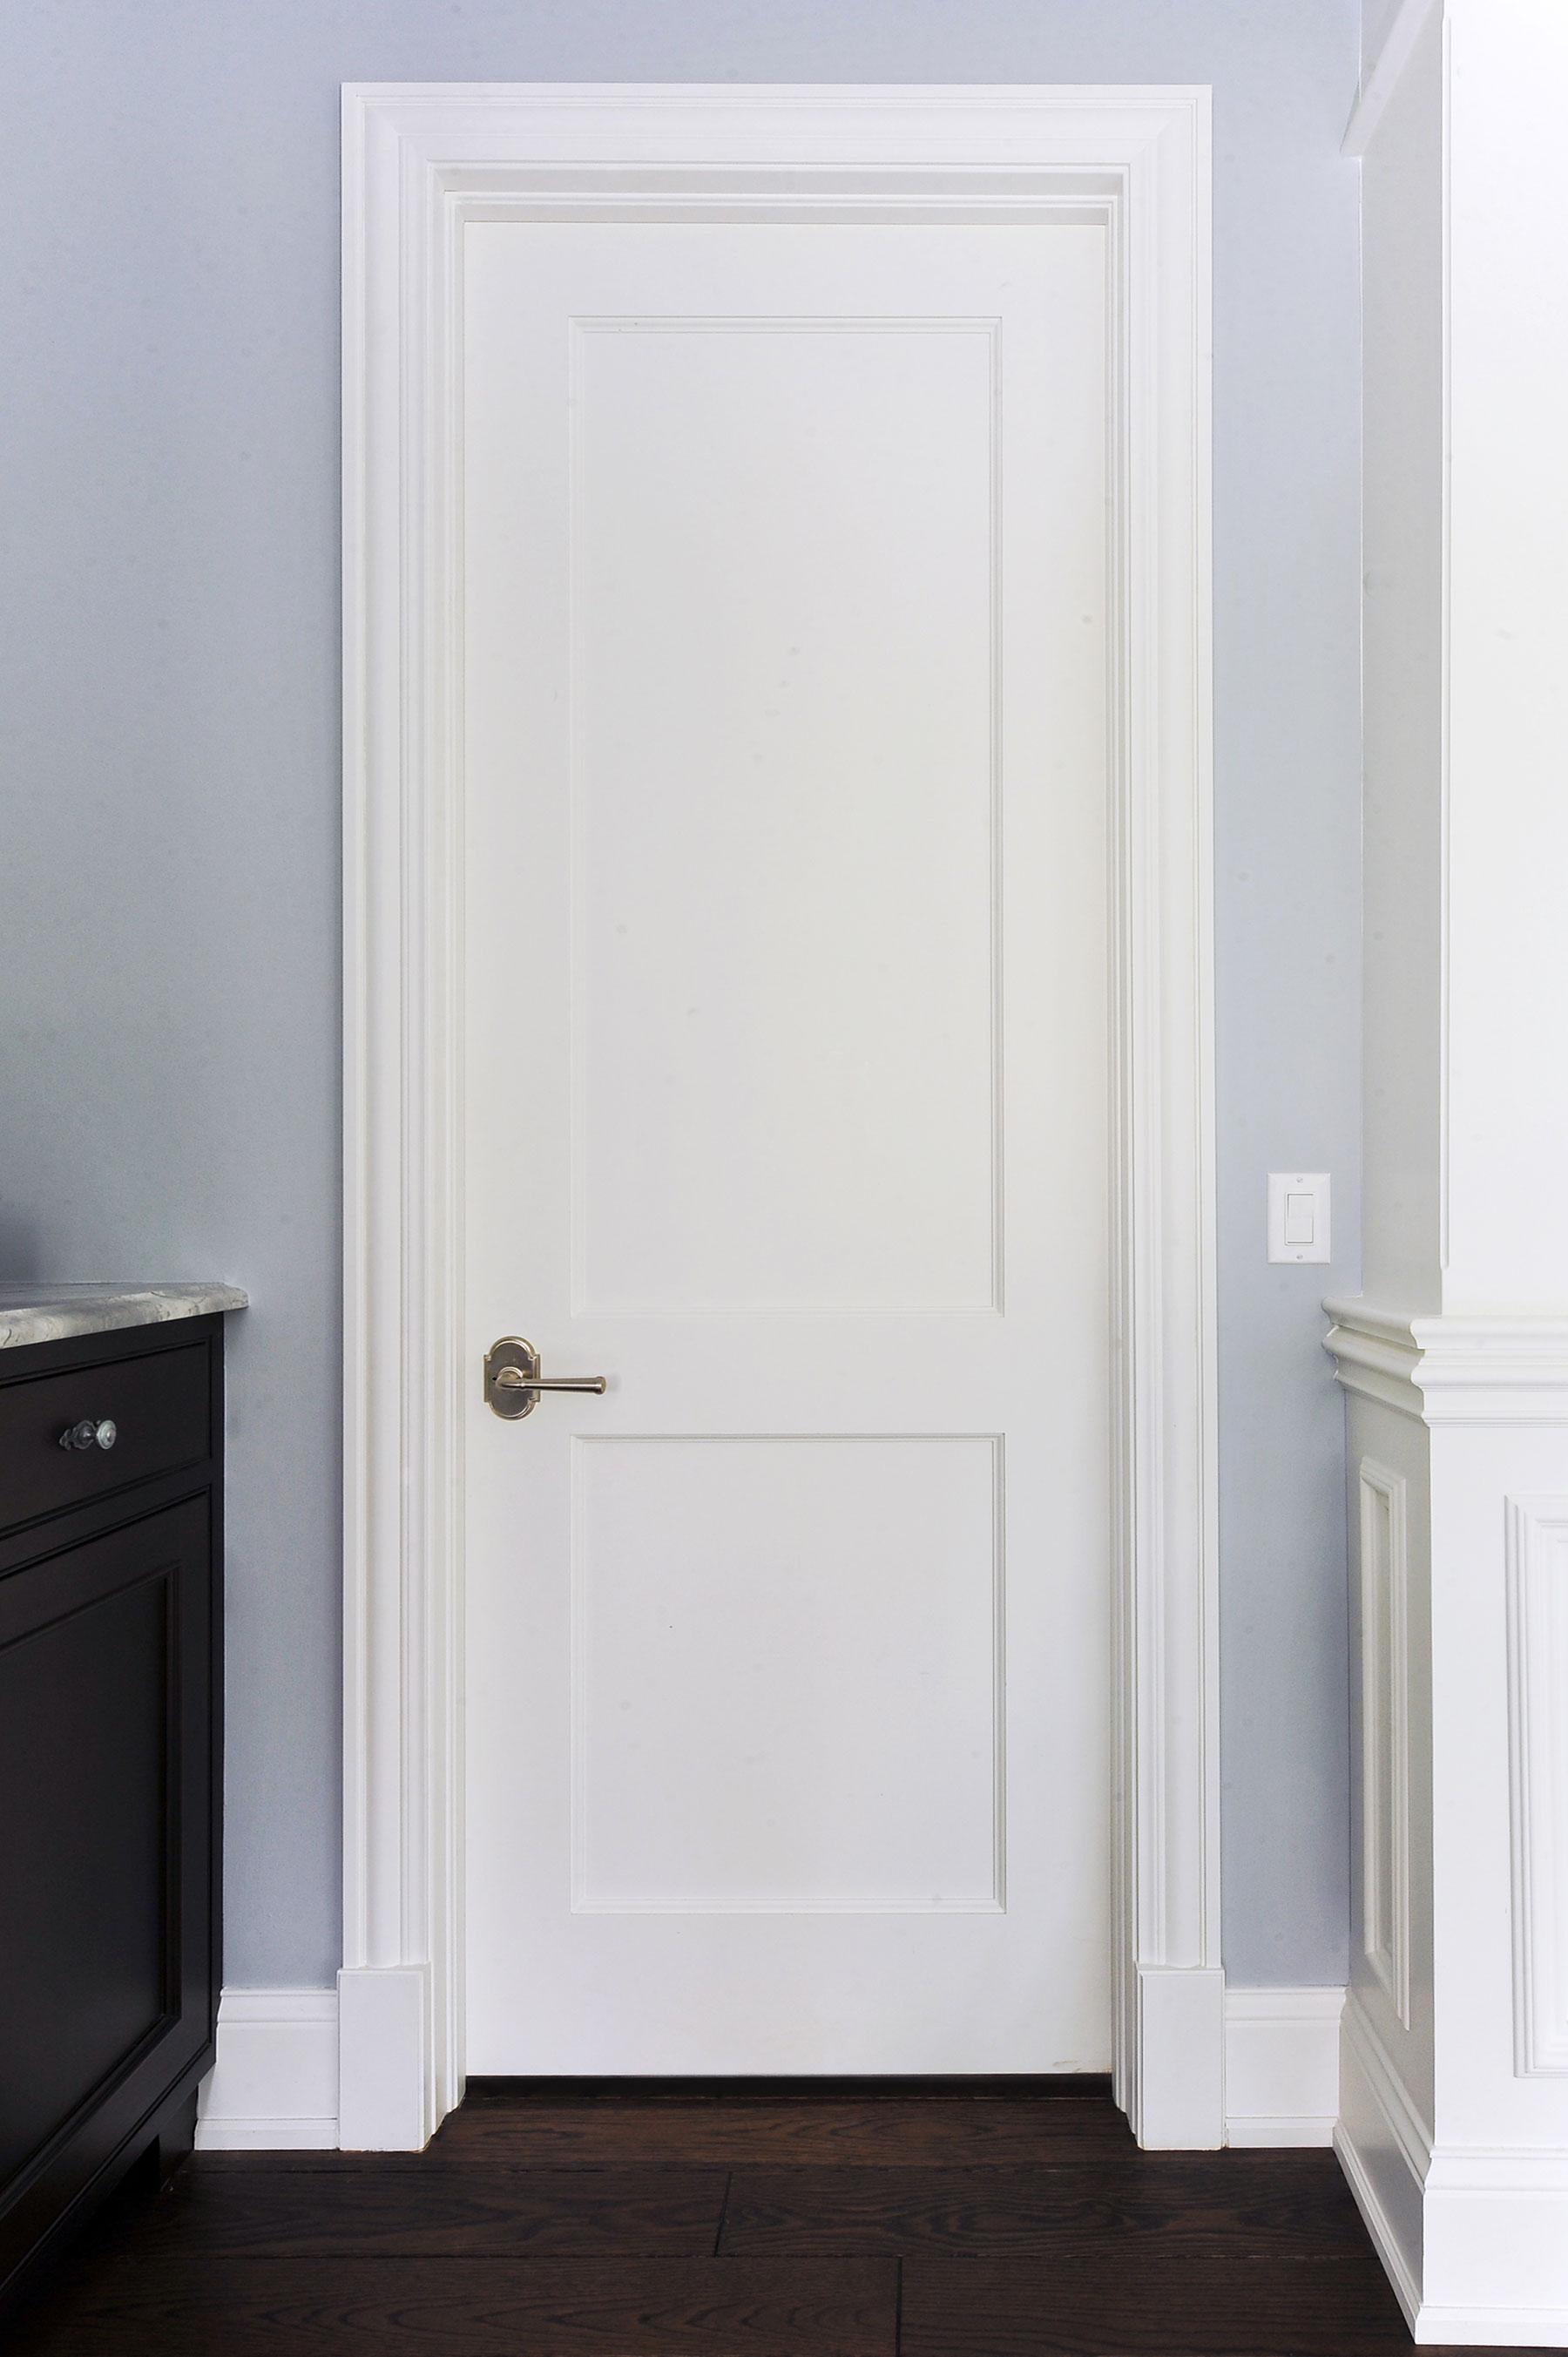 Custom Wood Interior Doors | 2 Flat Panel MDF Paint grade Interior Door  - Glenview Doors - Custom Doors in Chicago